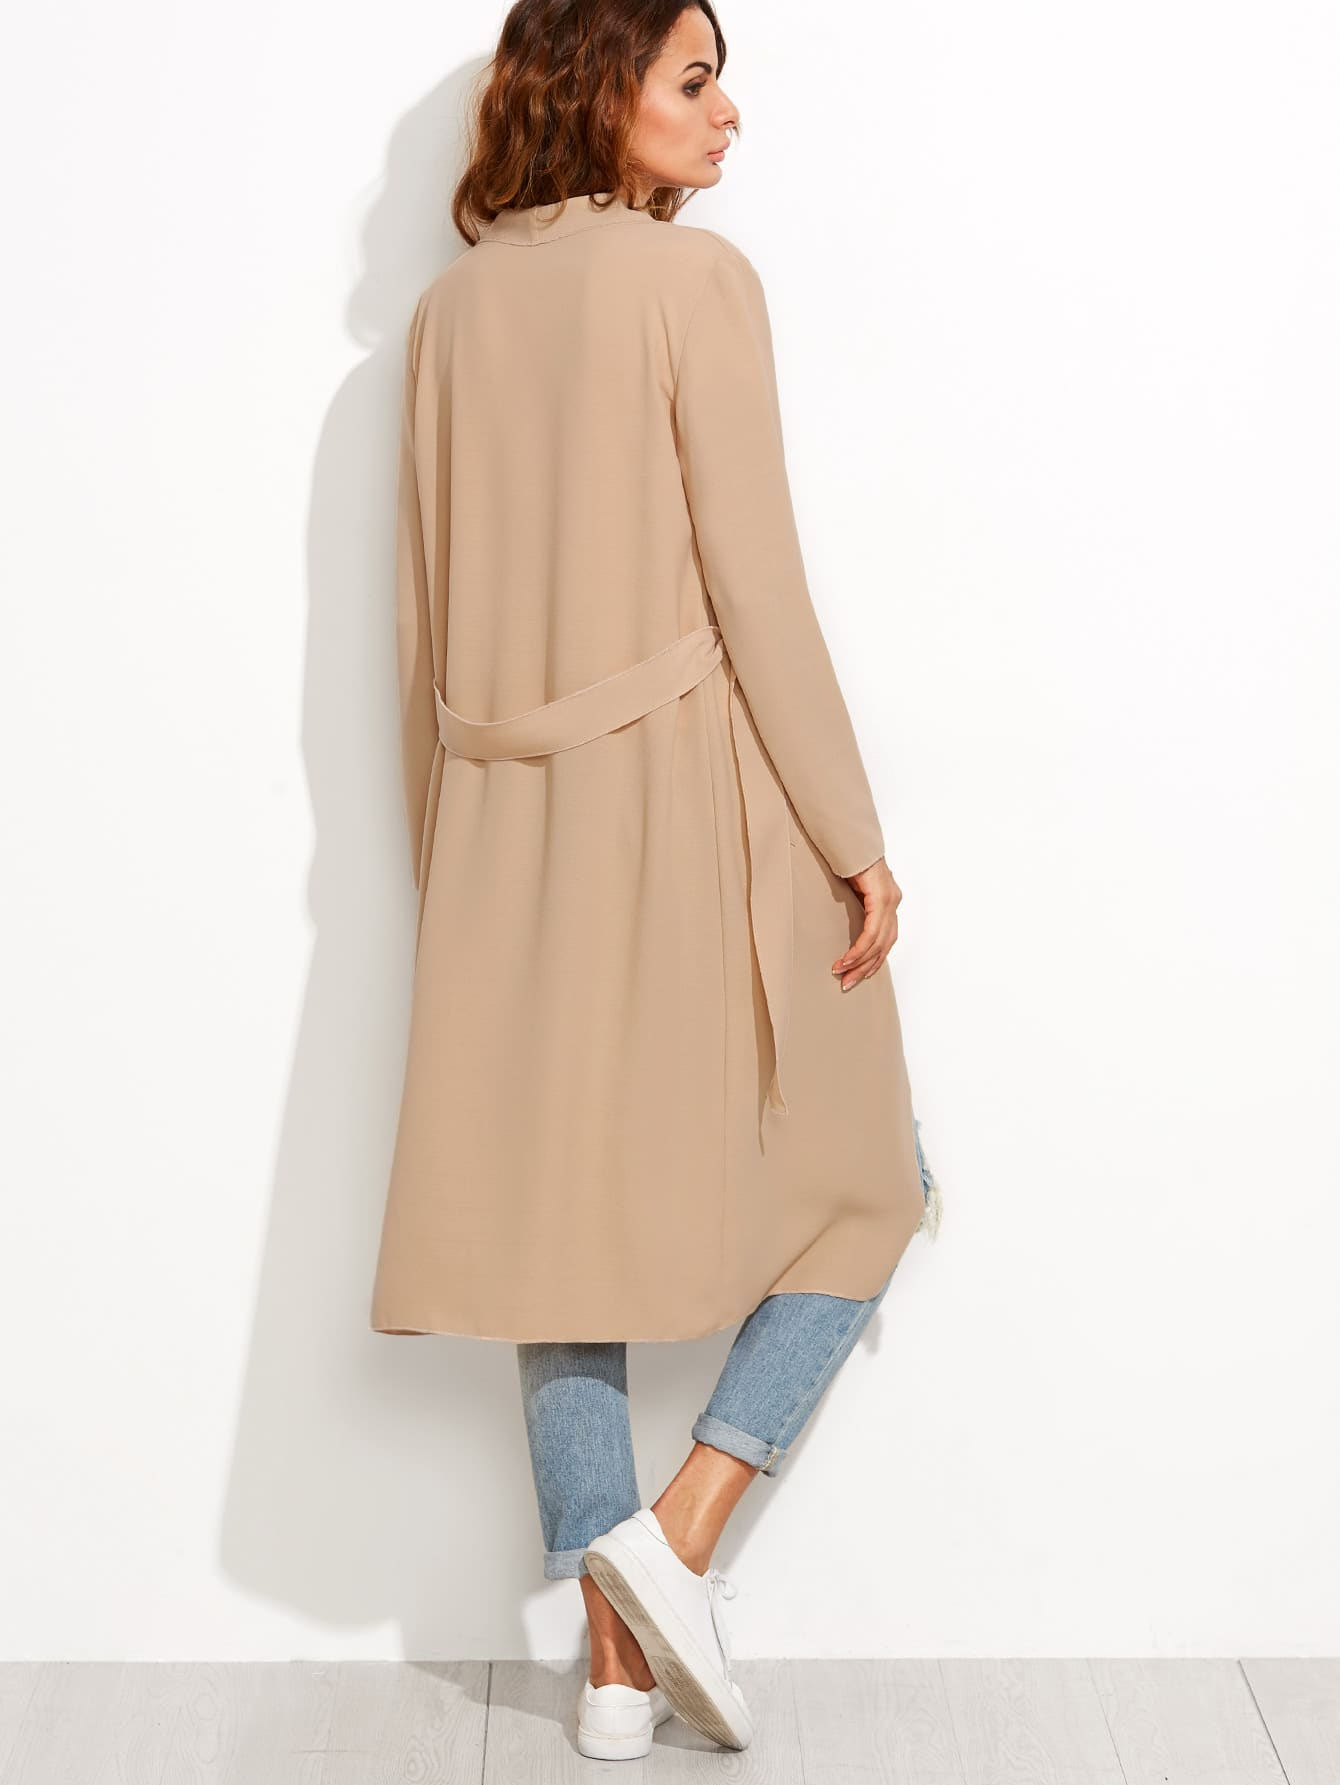 outerwear160811701_2